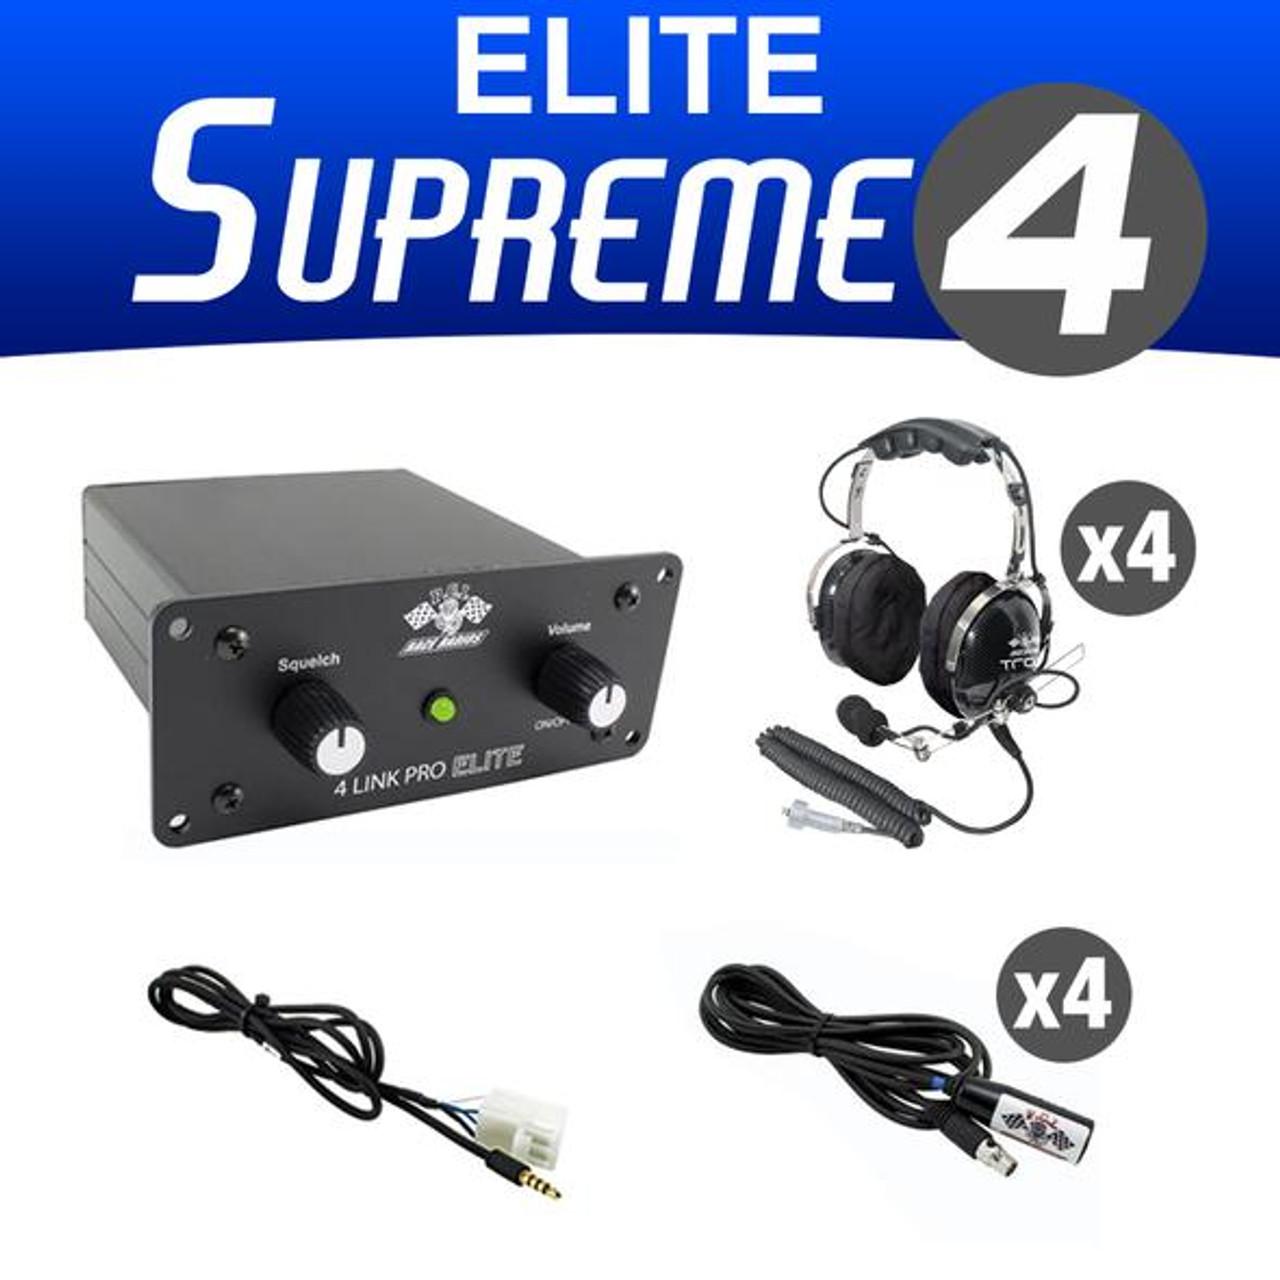 Elite Supreme 4